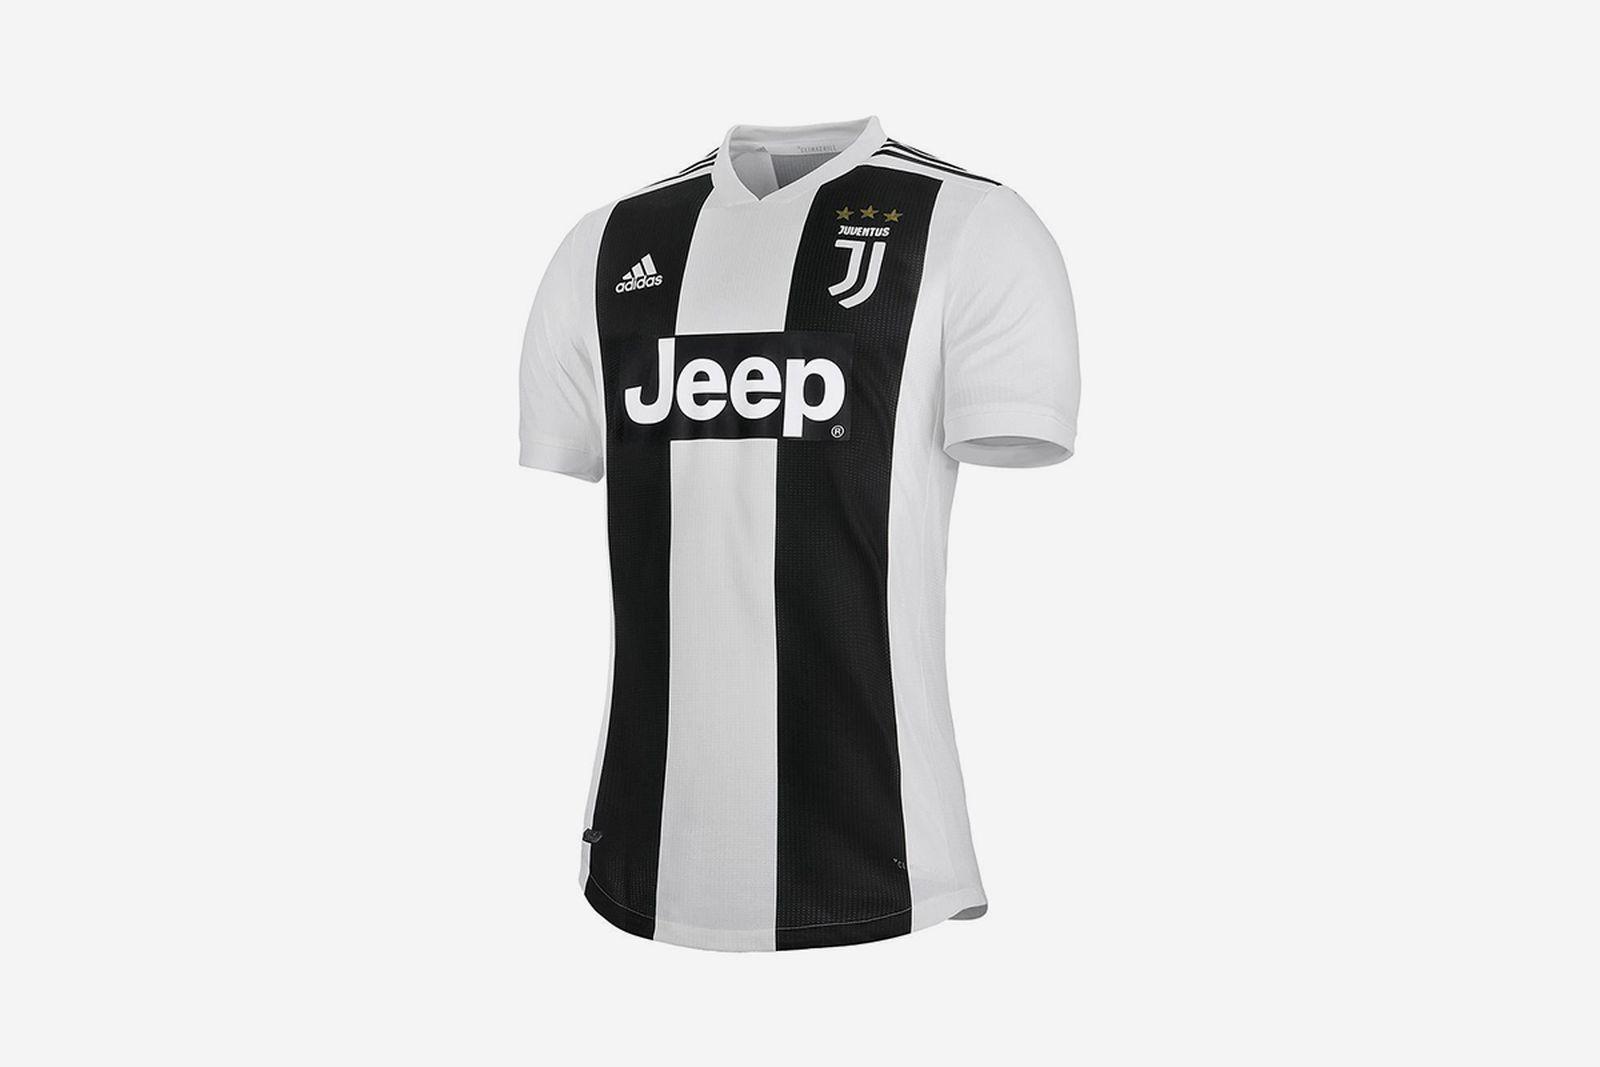 Cristiano Ronaldo Juventus Jersey: Where to Buy Online